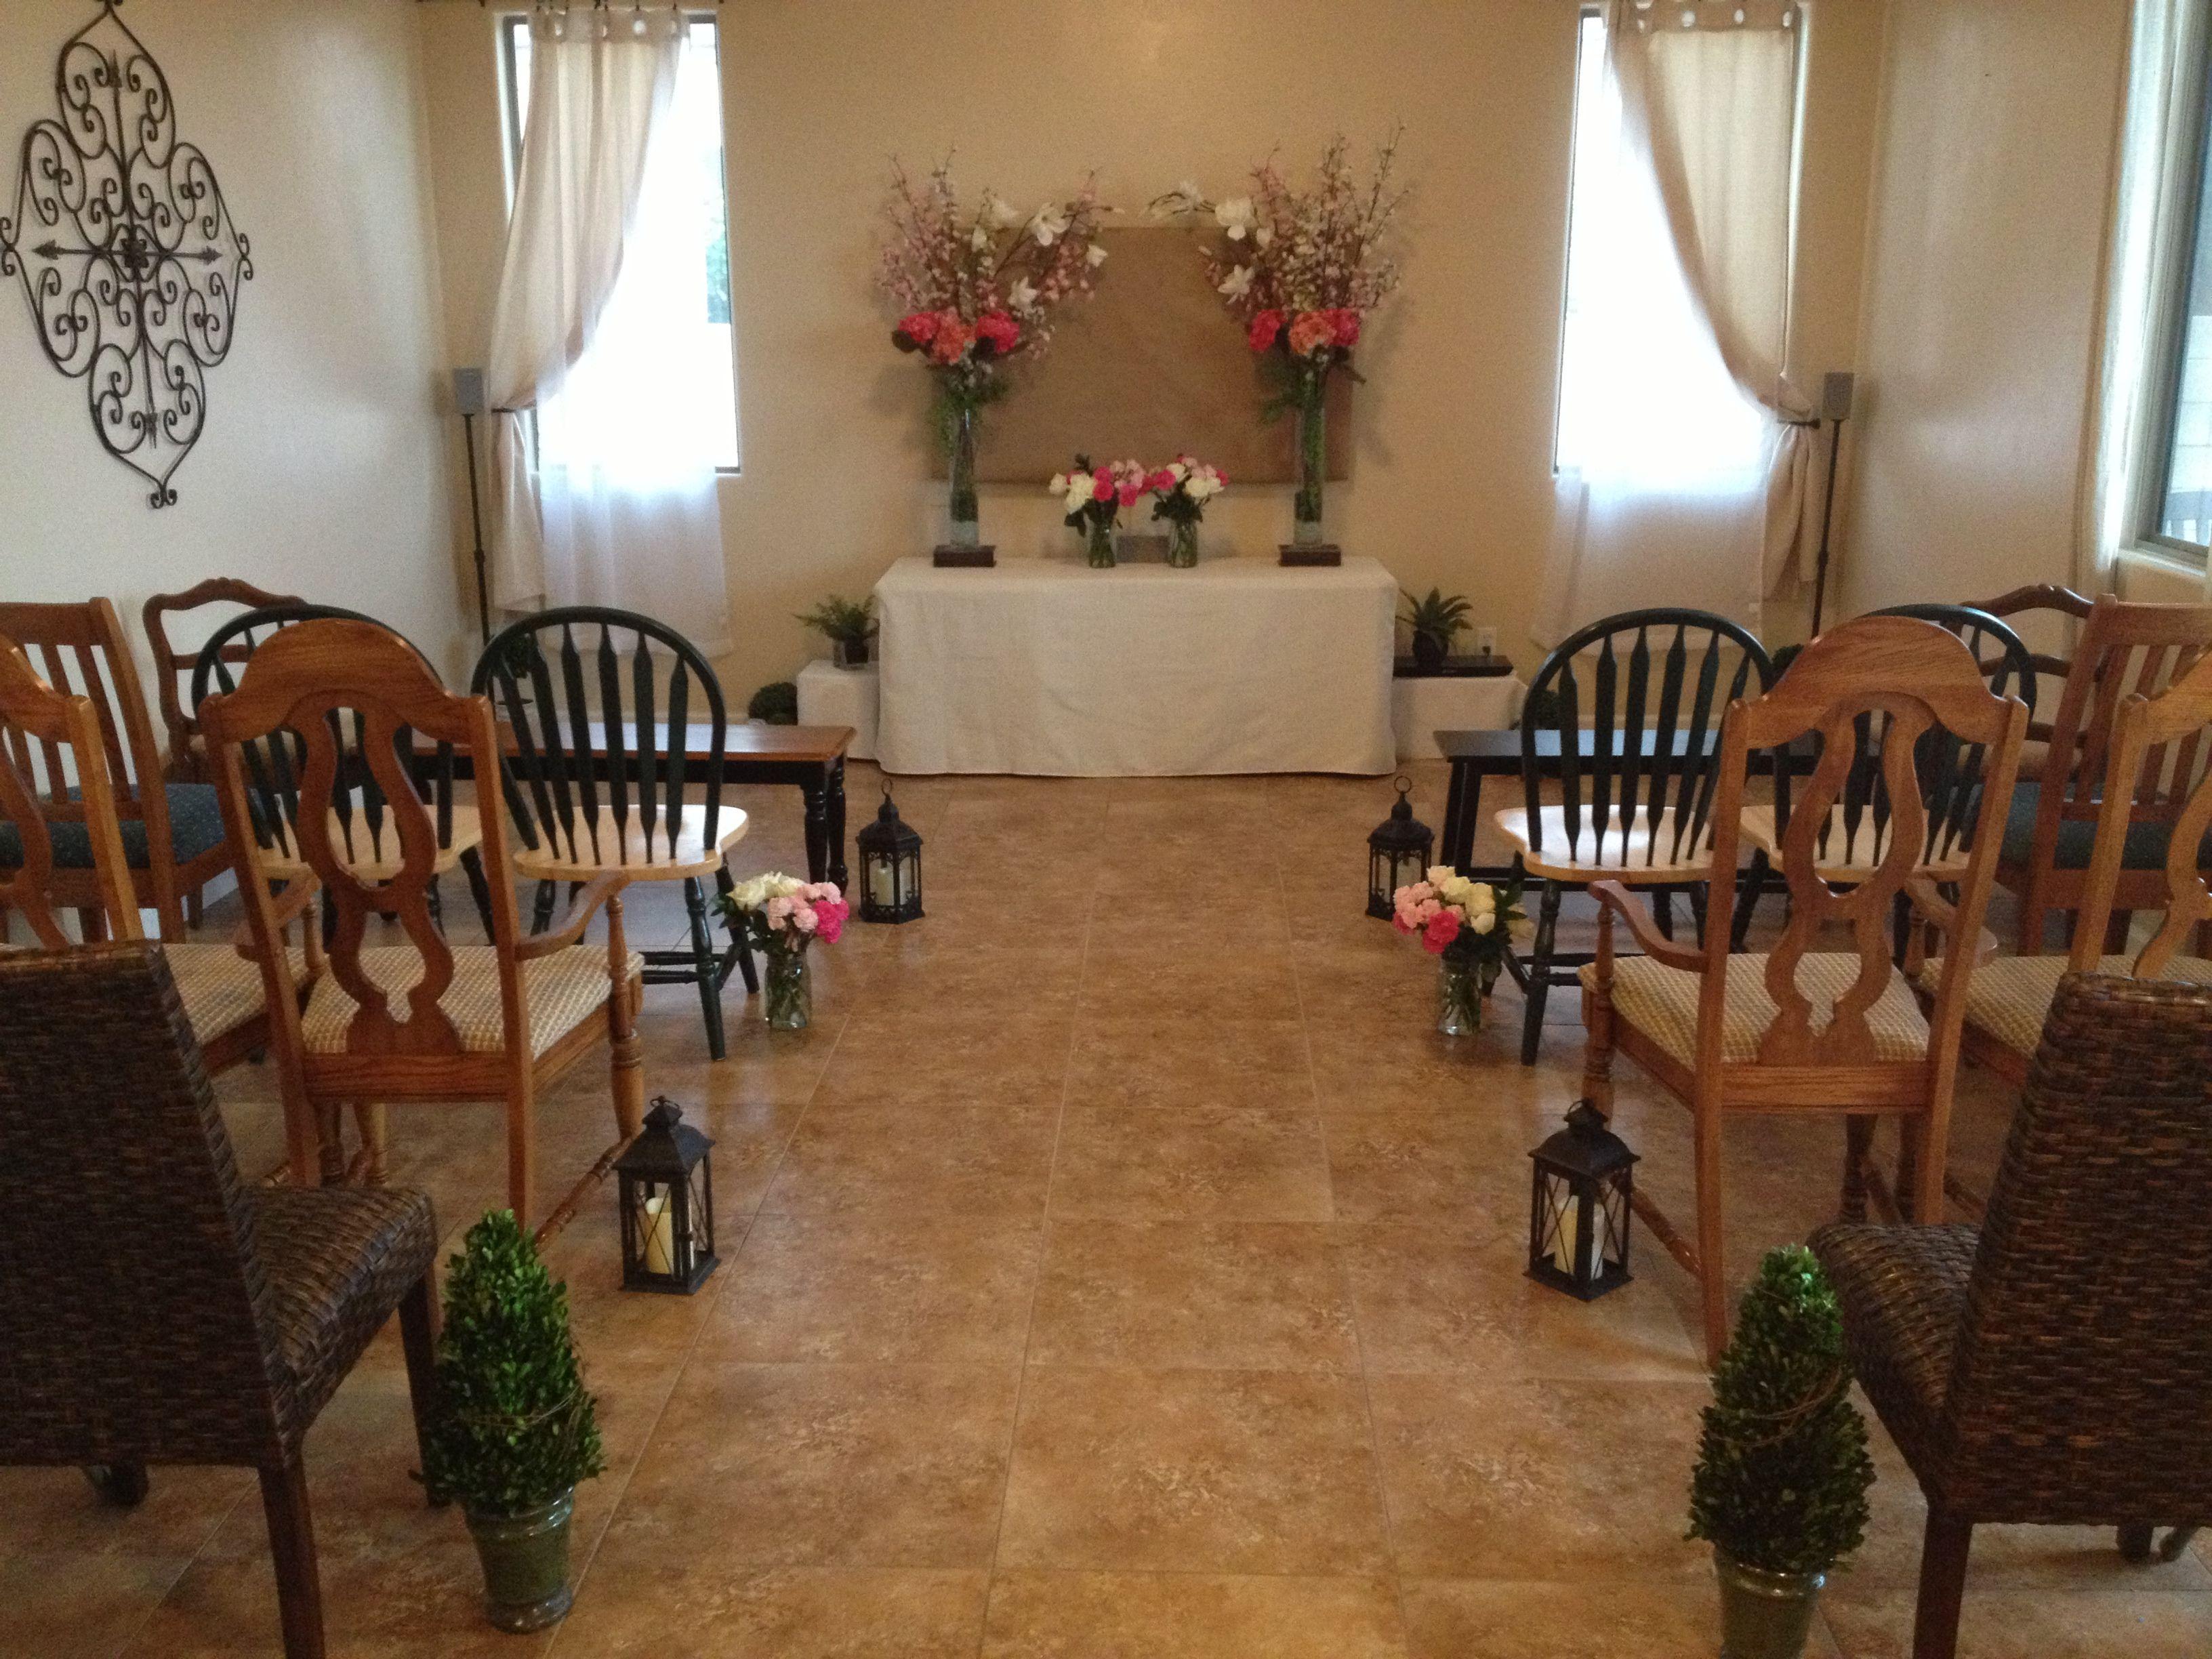 Living Room Wedding | Small intimate wedding, Ceremony ...